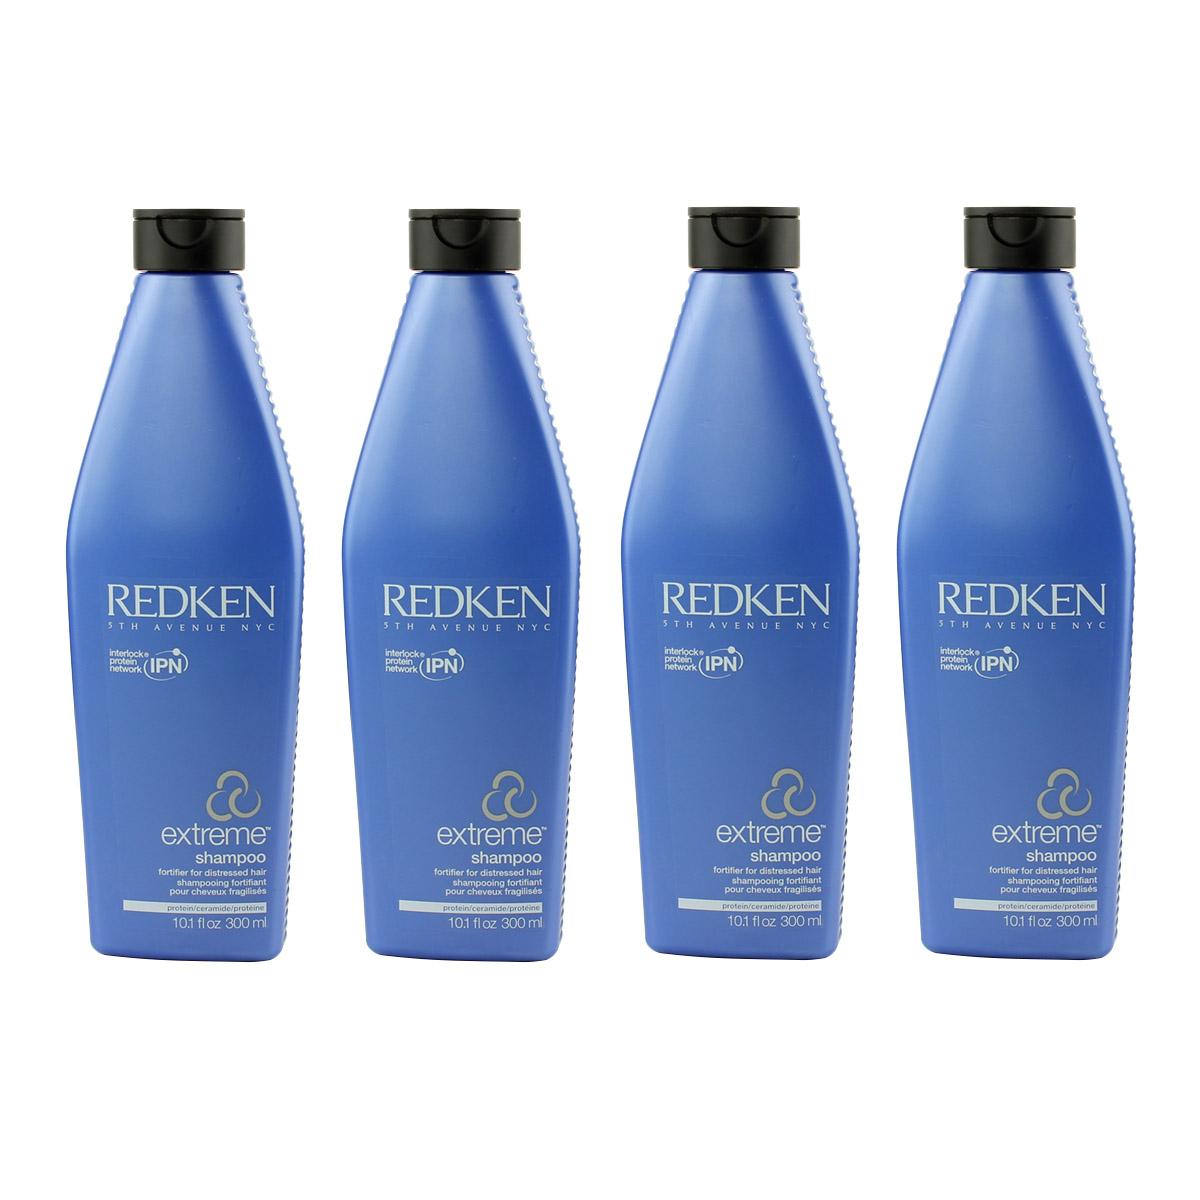 Redken Extreme Shampoo 4 x 300 ml